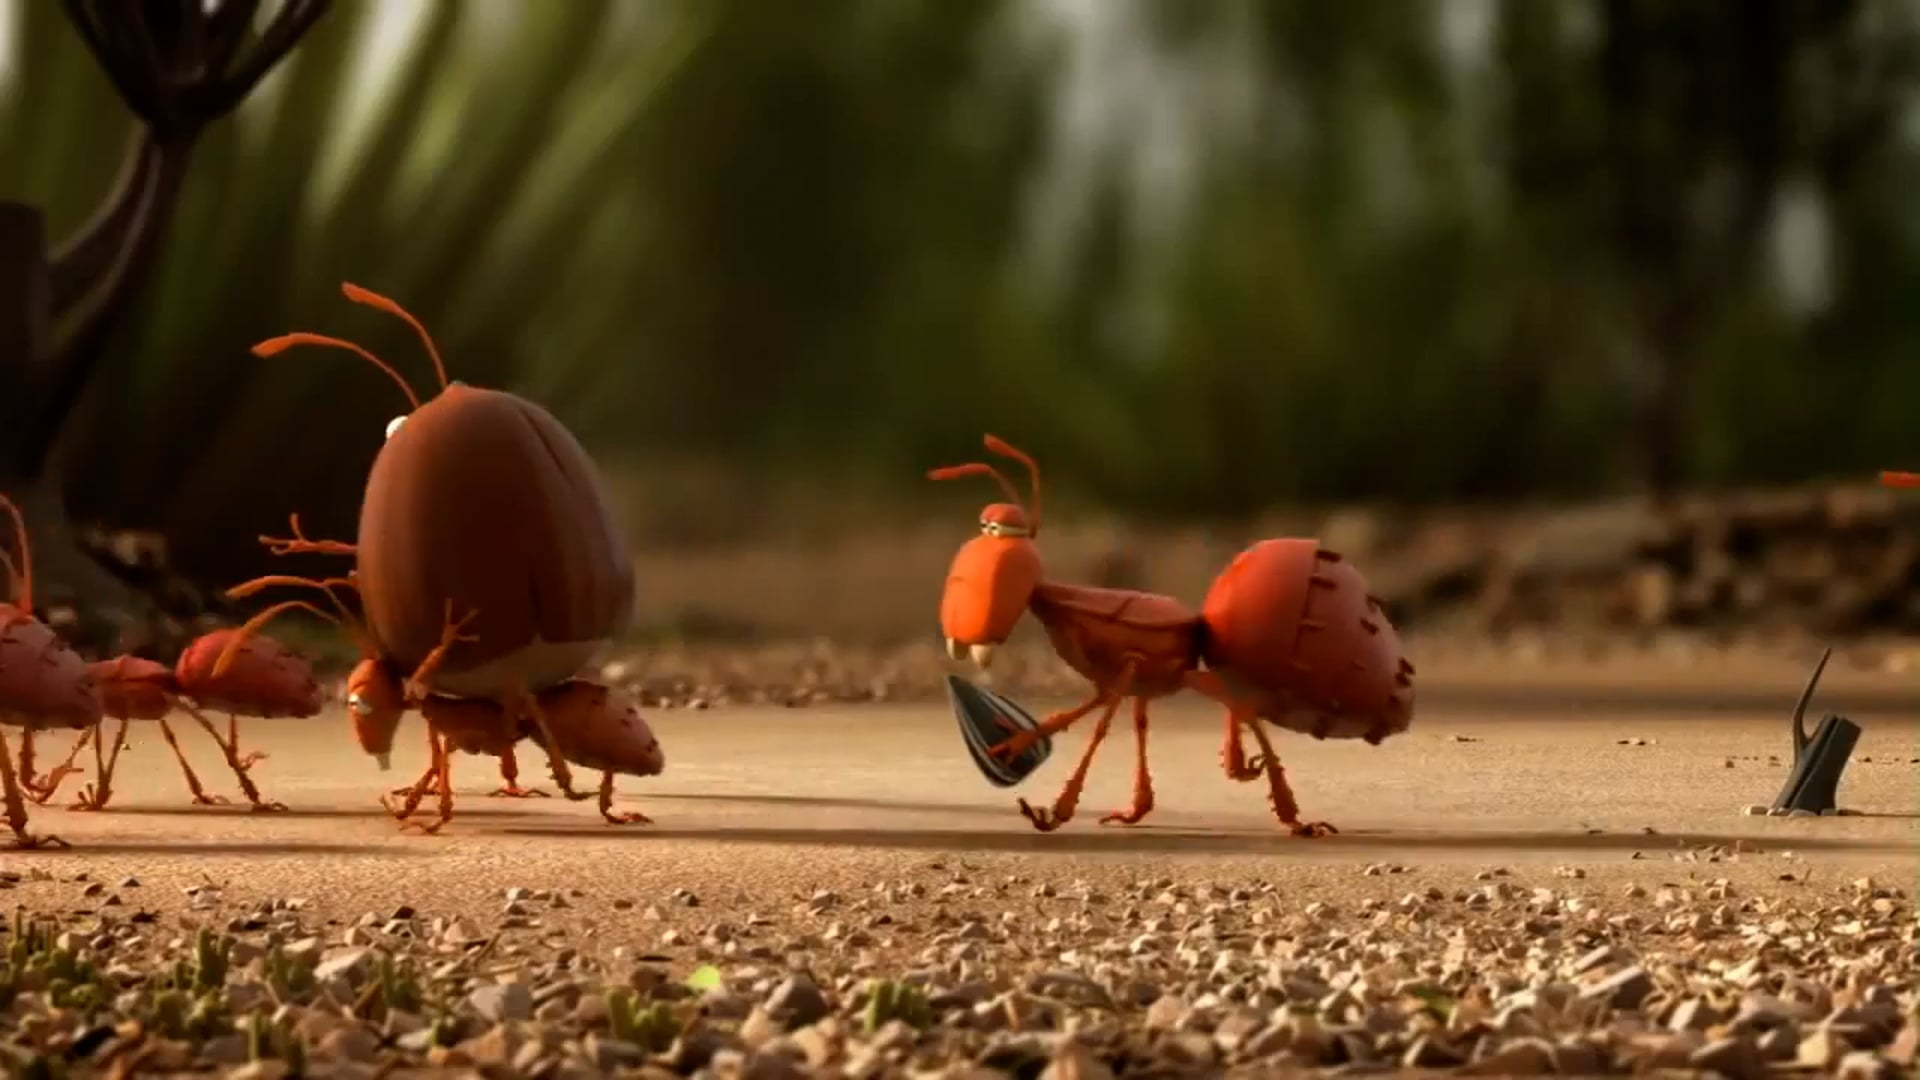 Ants & Anteater